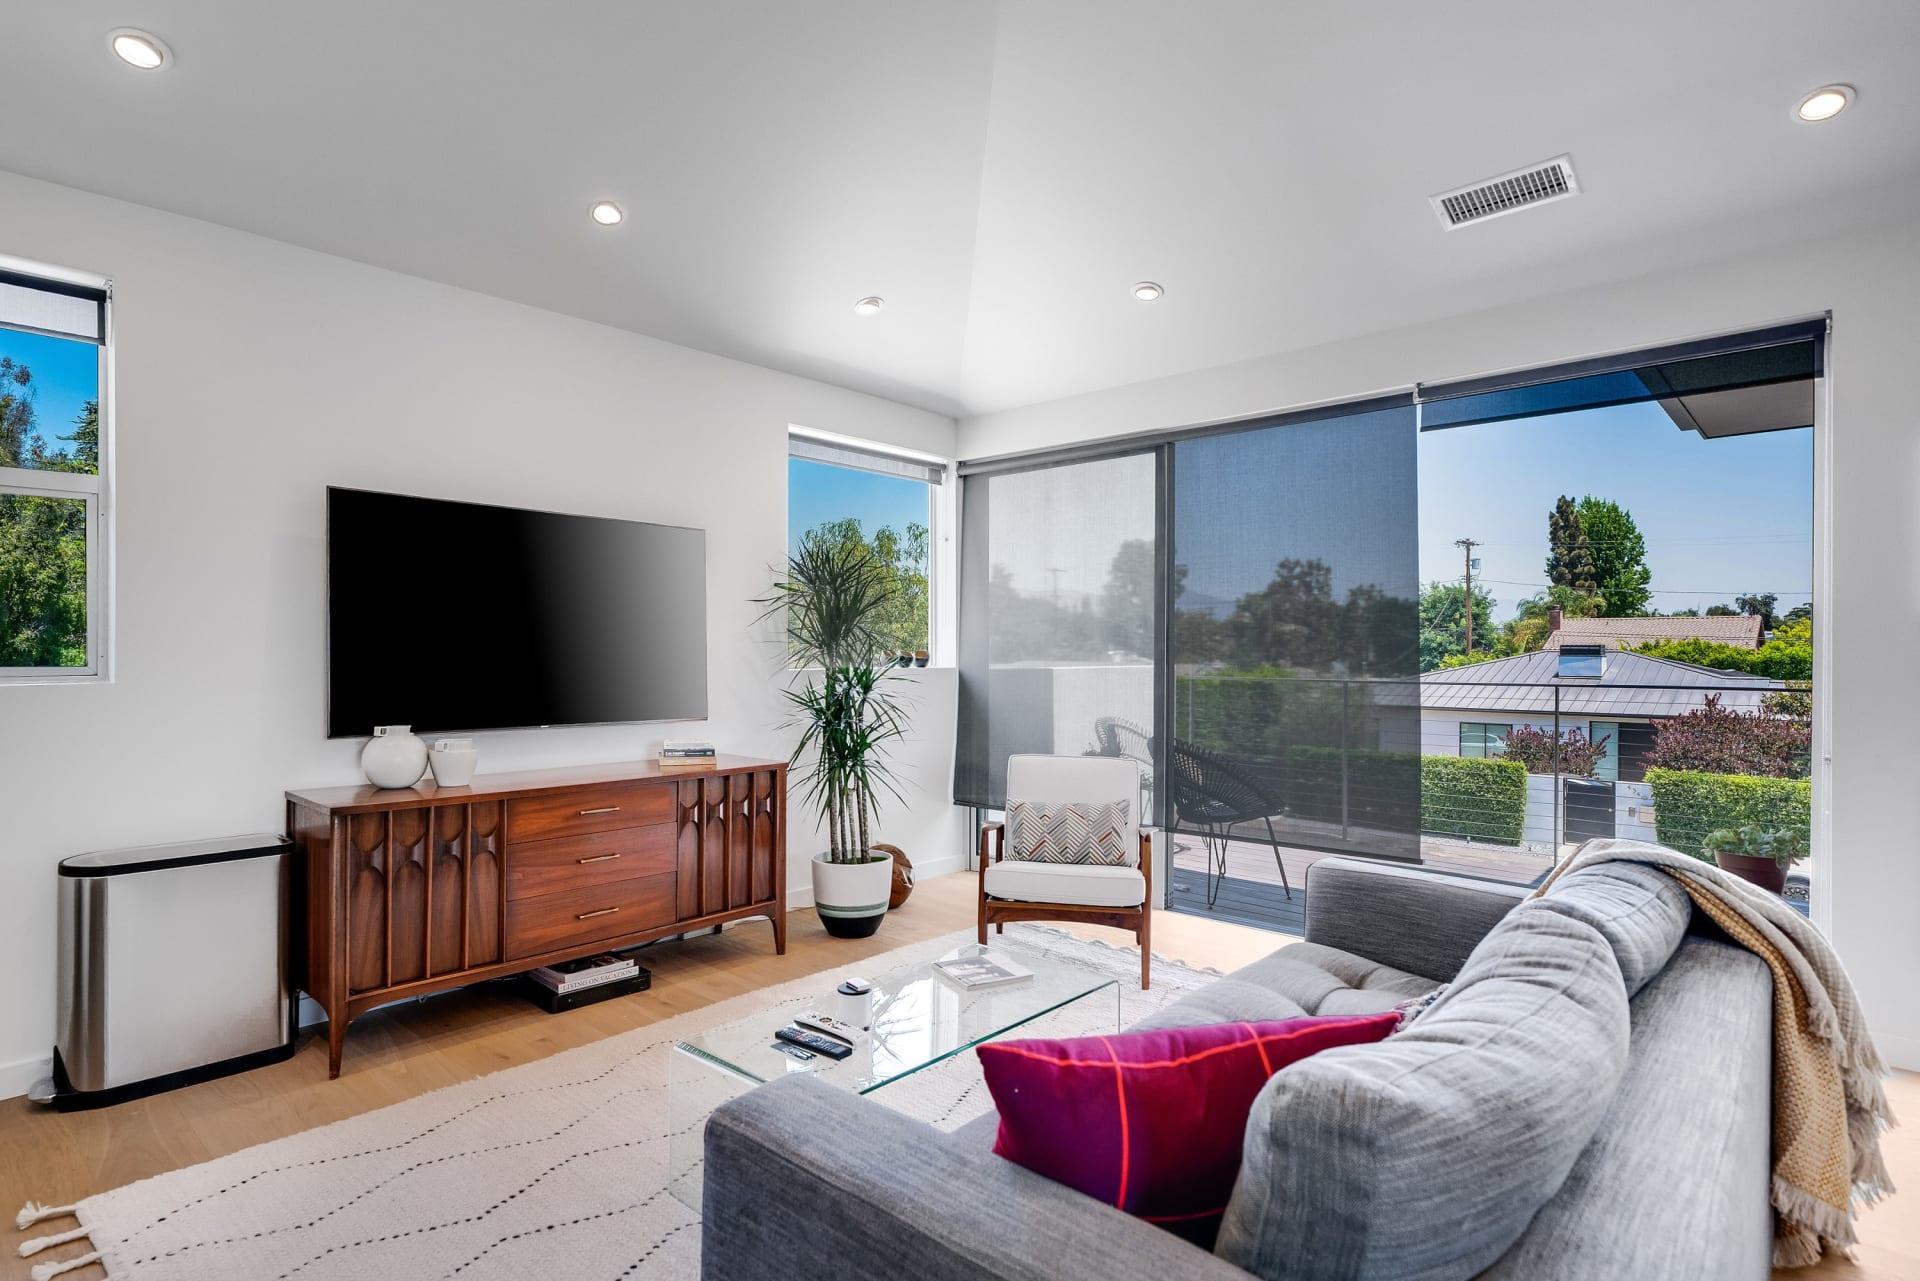 Studio City Modern 1 + office loft - short/long term lease photo